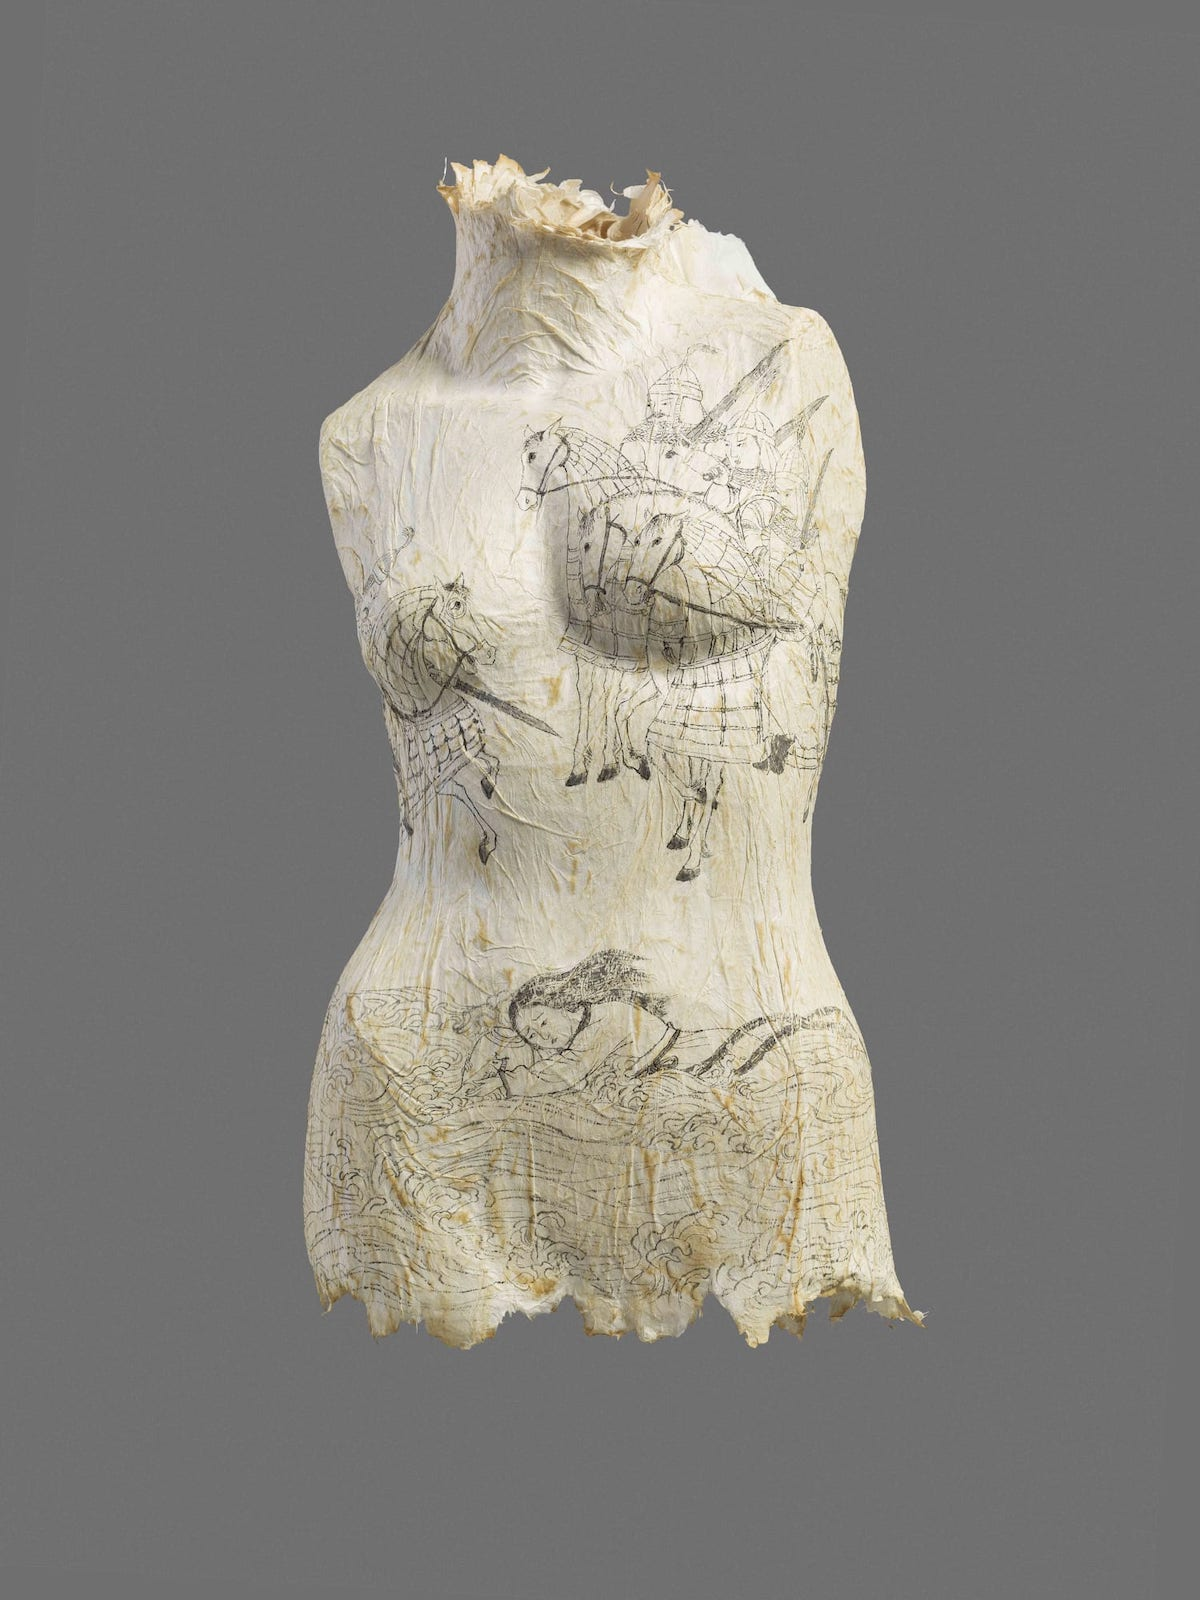 Feminine Torso Paper Sculpture